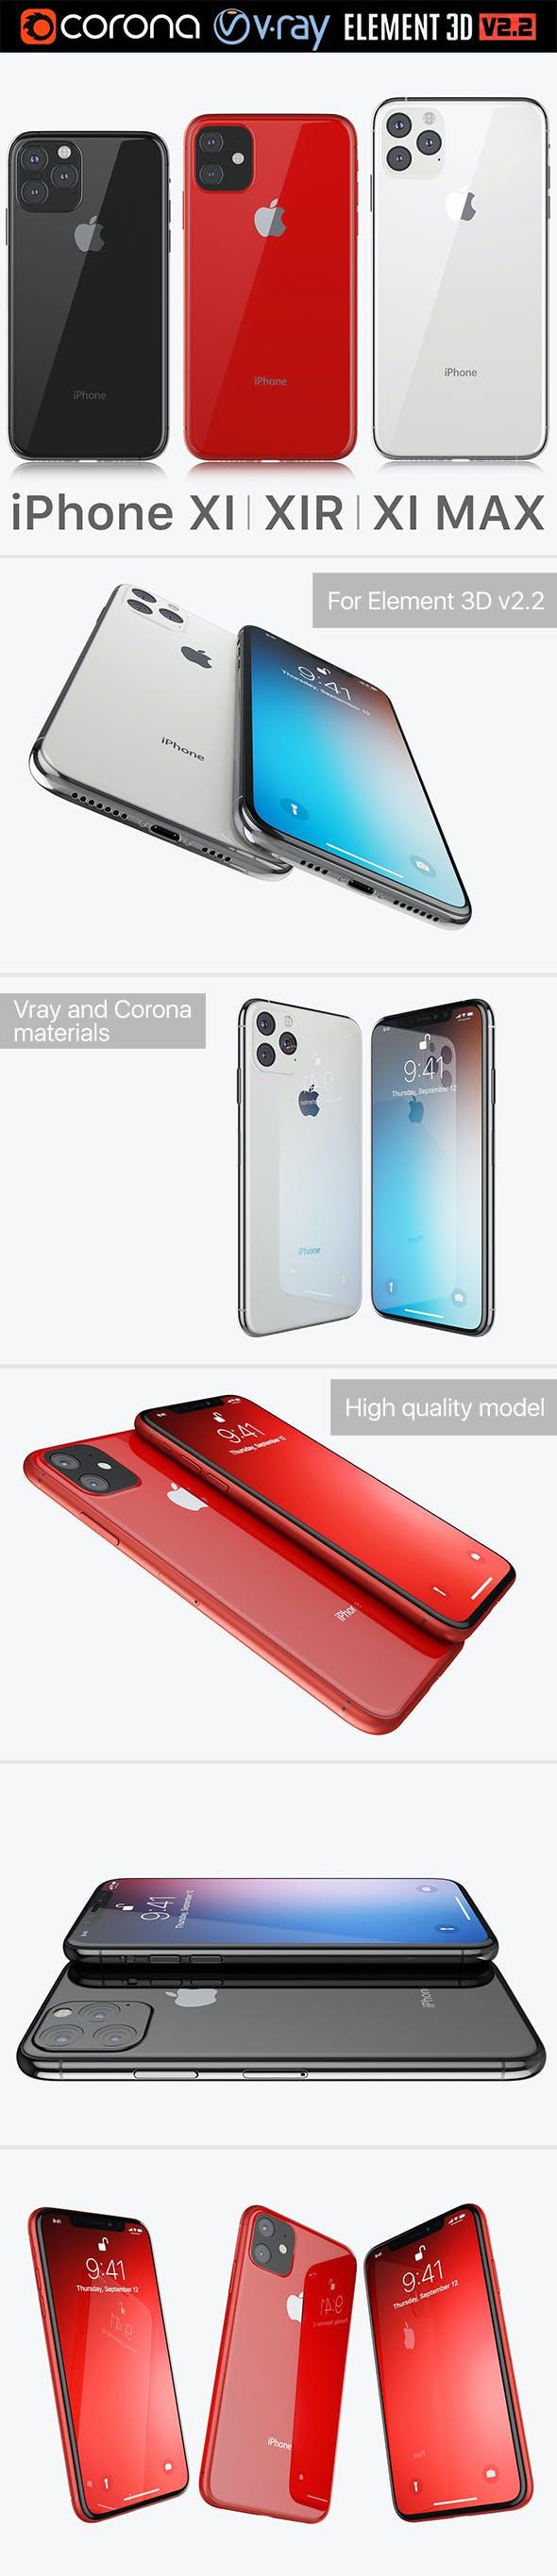 Apple iPhone XI & XI MAX & XIR 2019 - 3DOcean Item for Sale